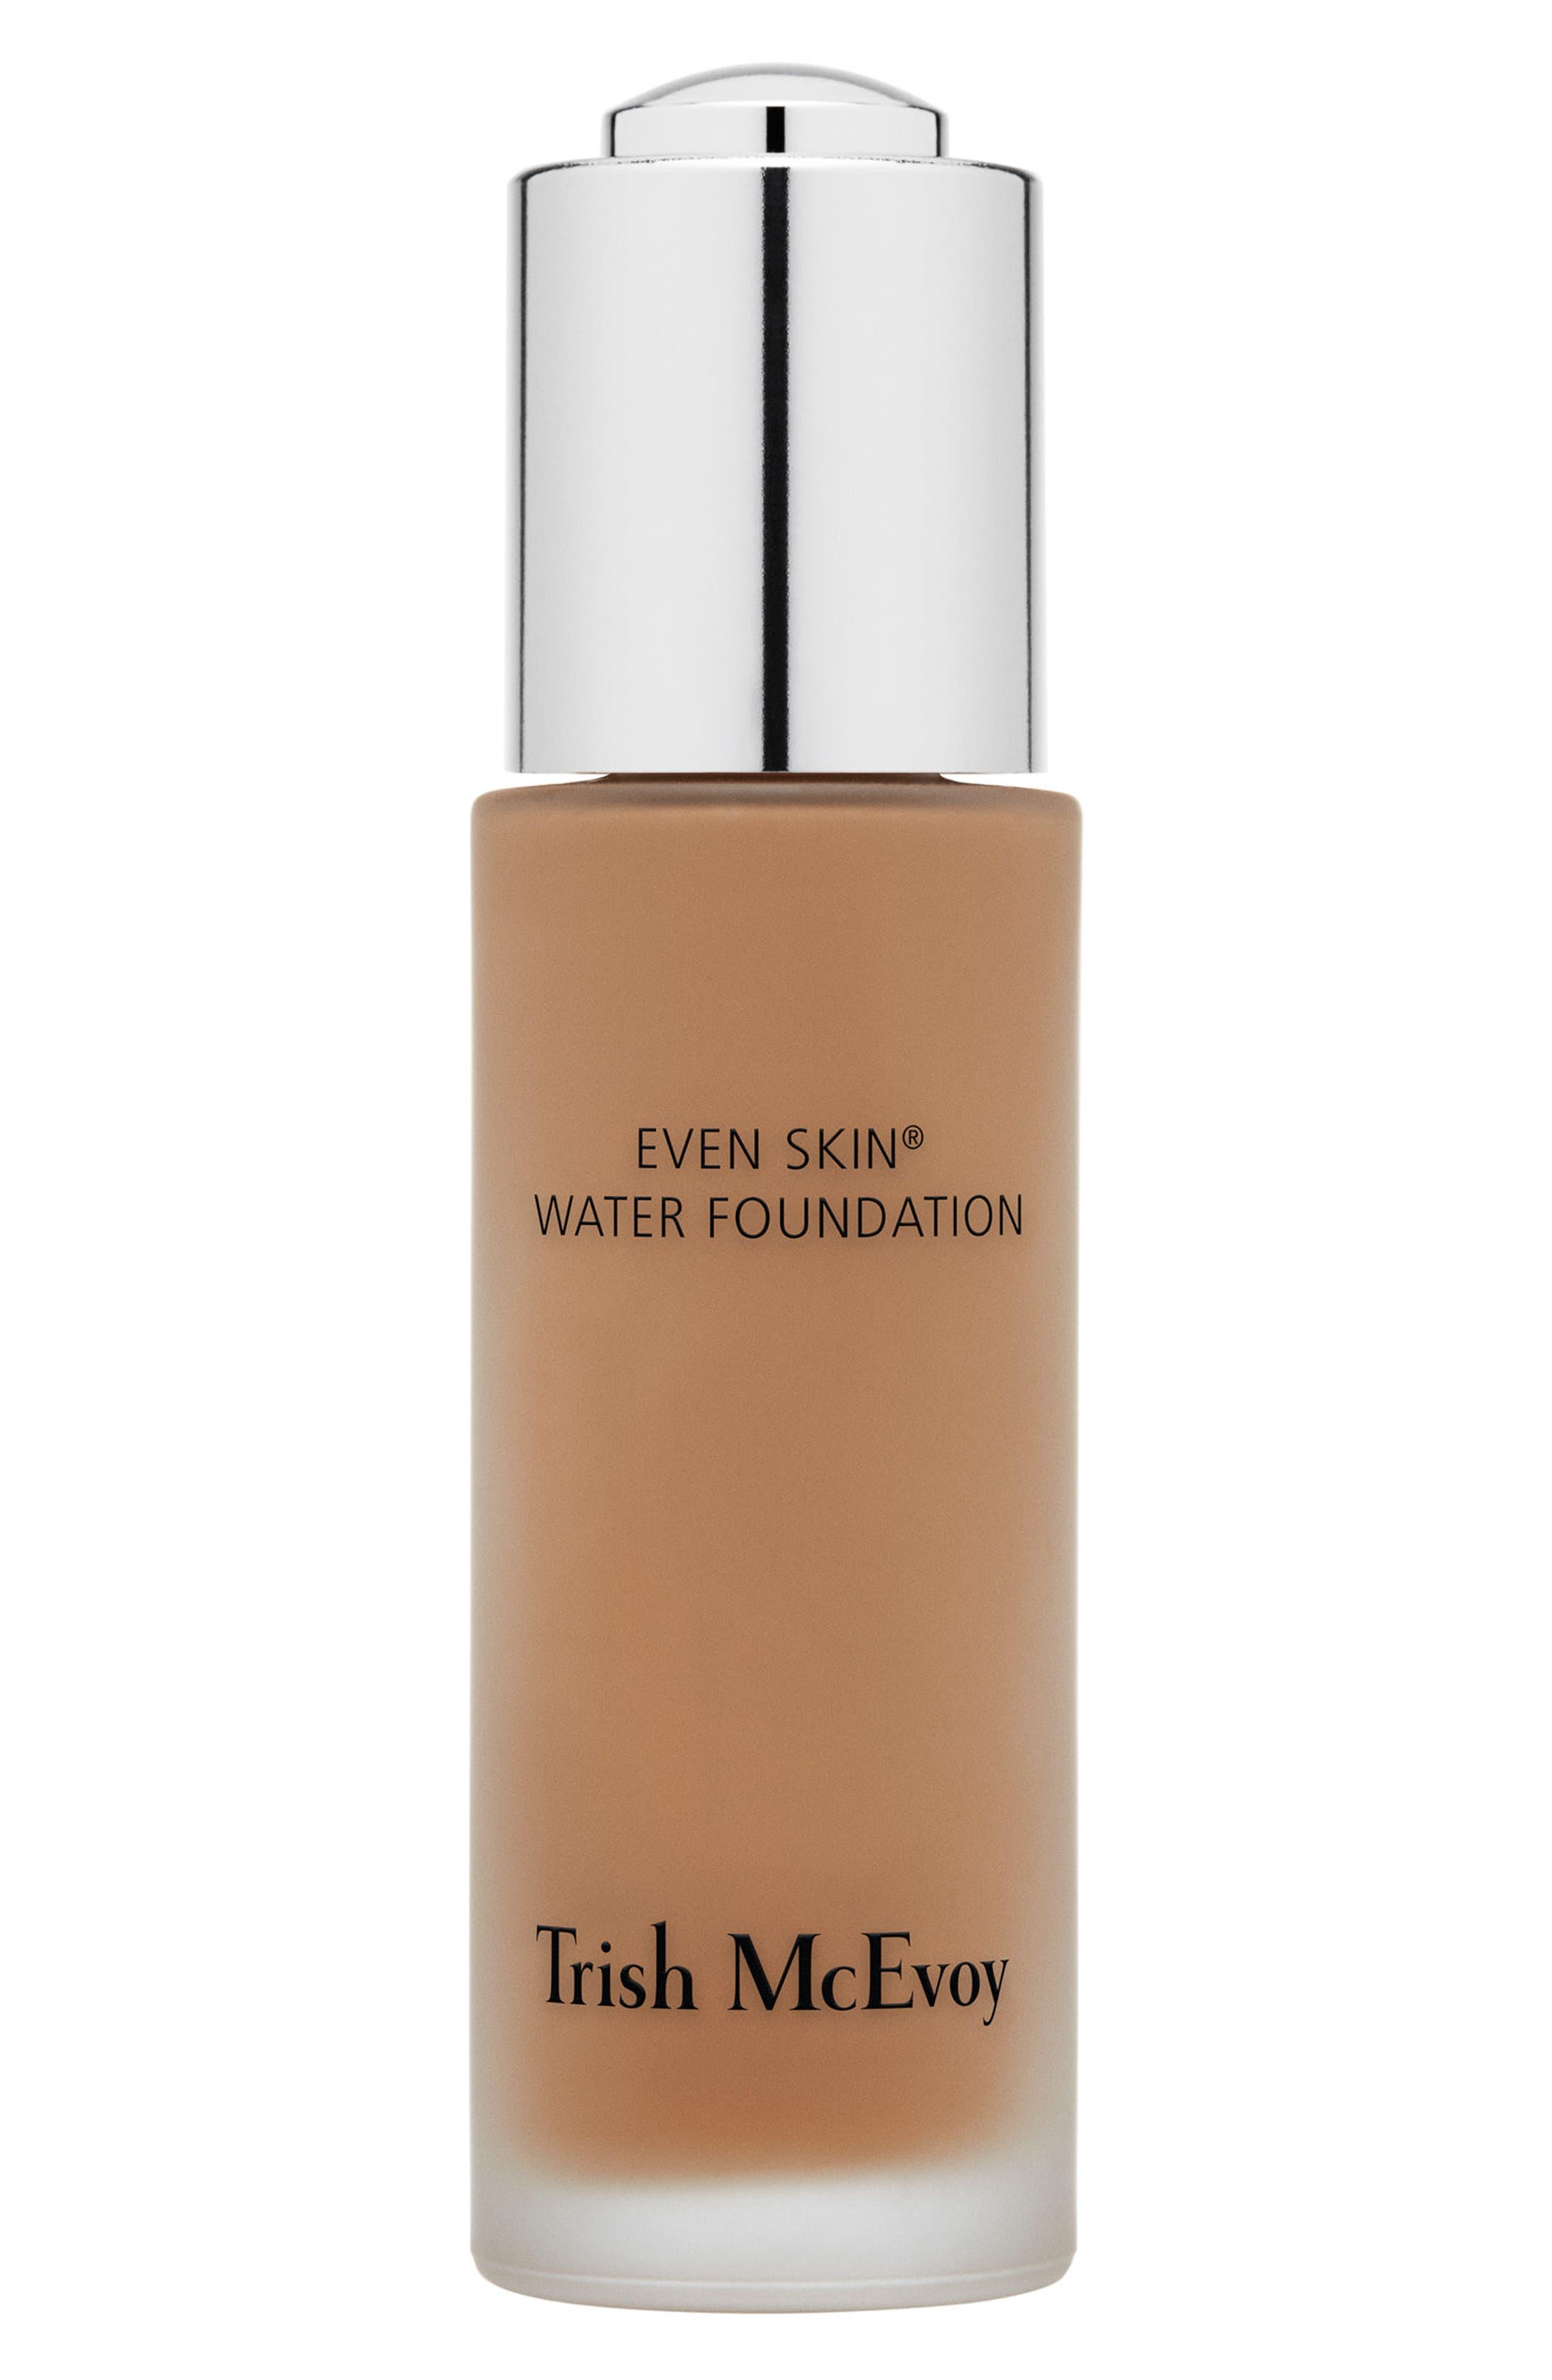 Trish McEvoy 'Even Skin®' Water Foundation